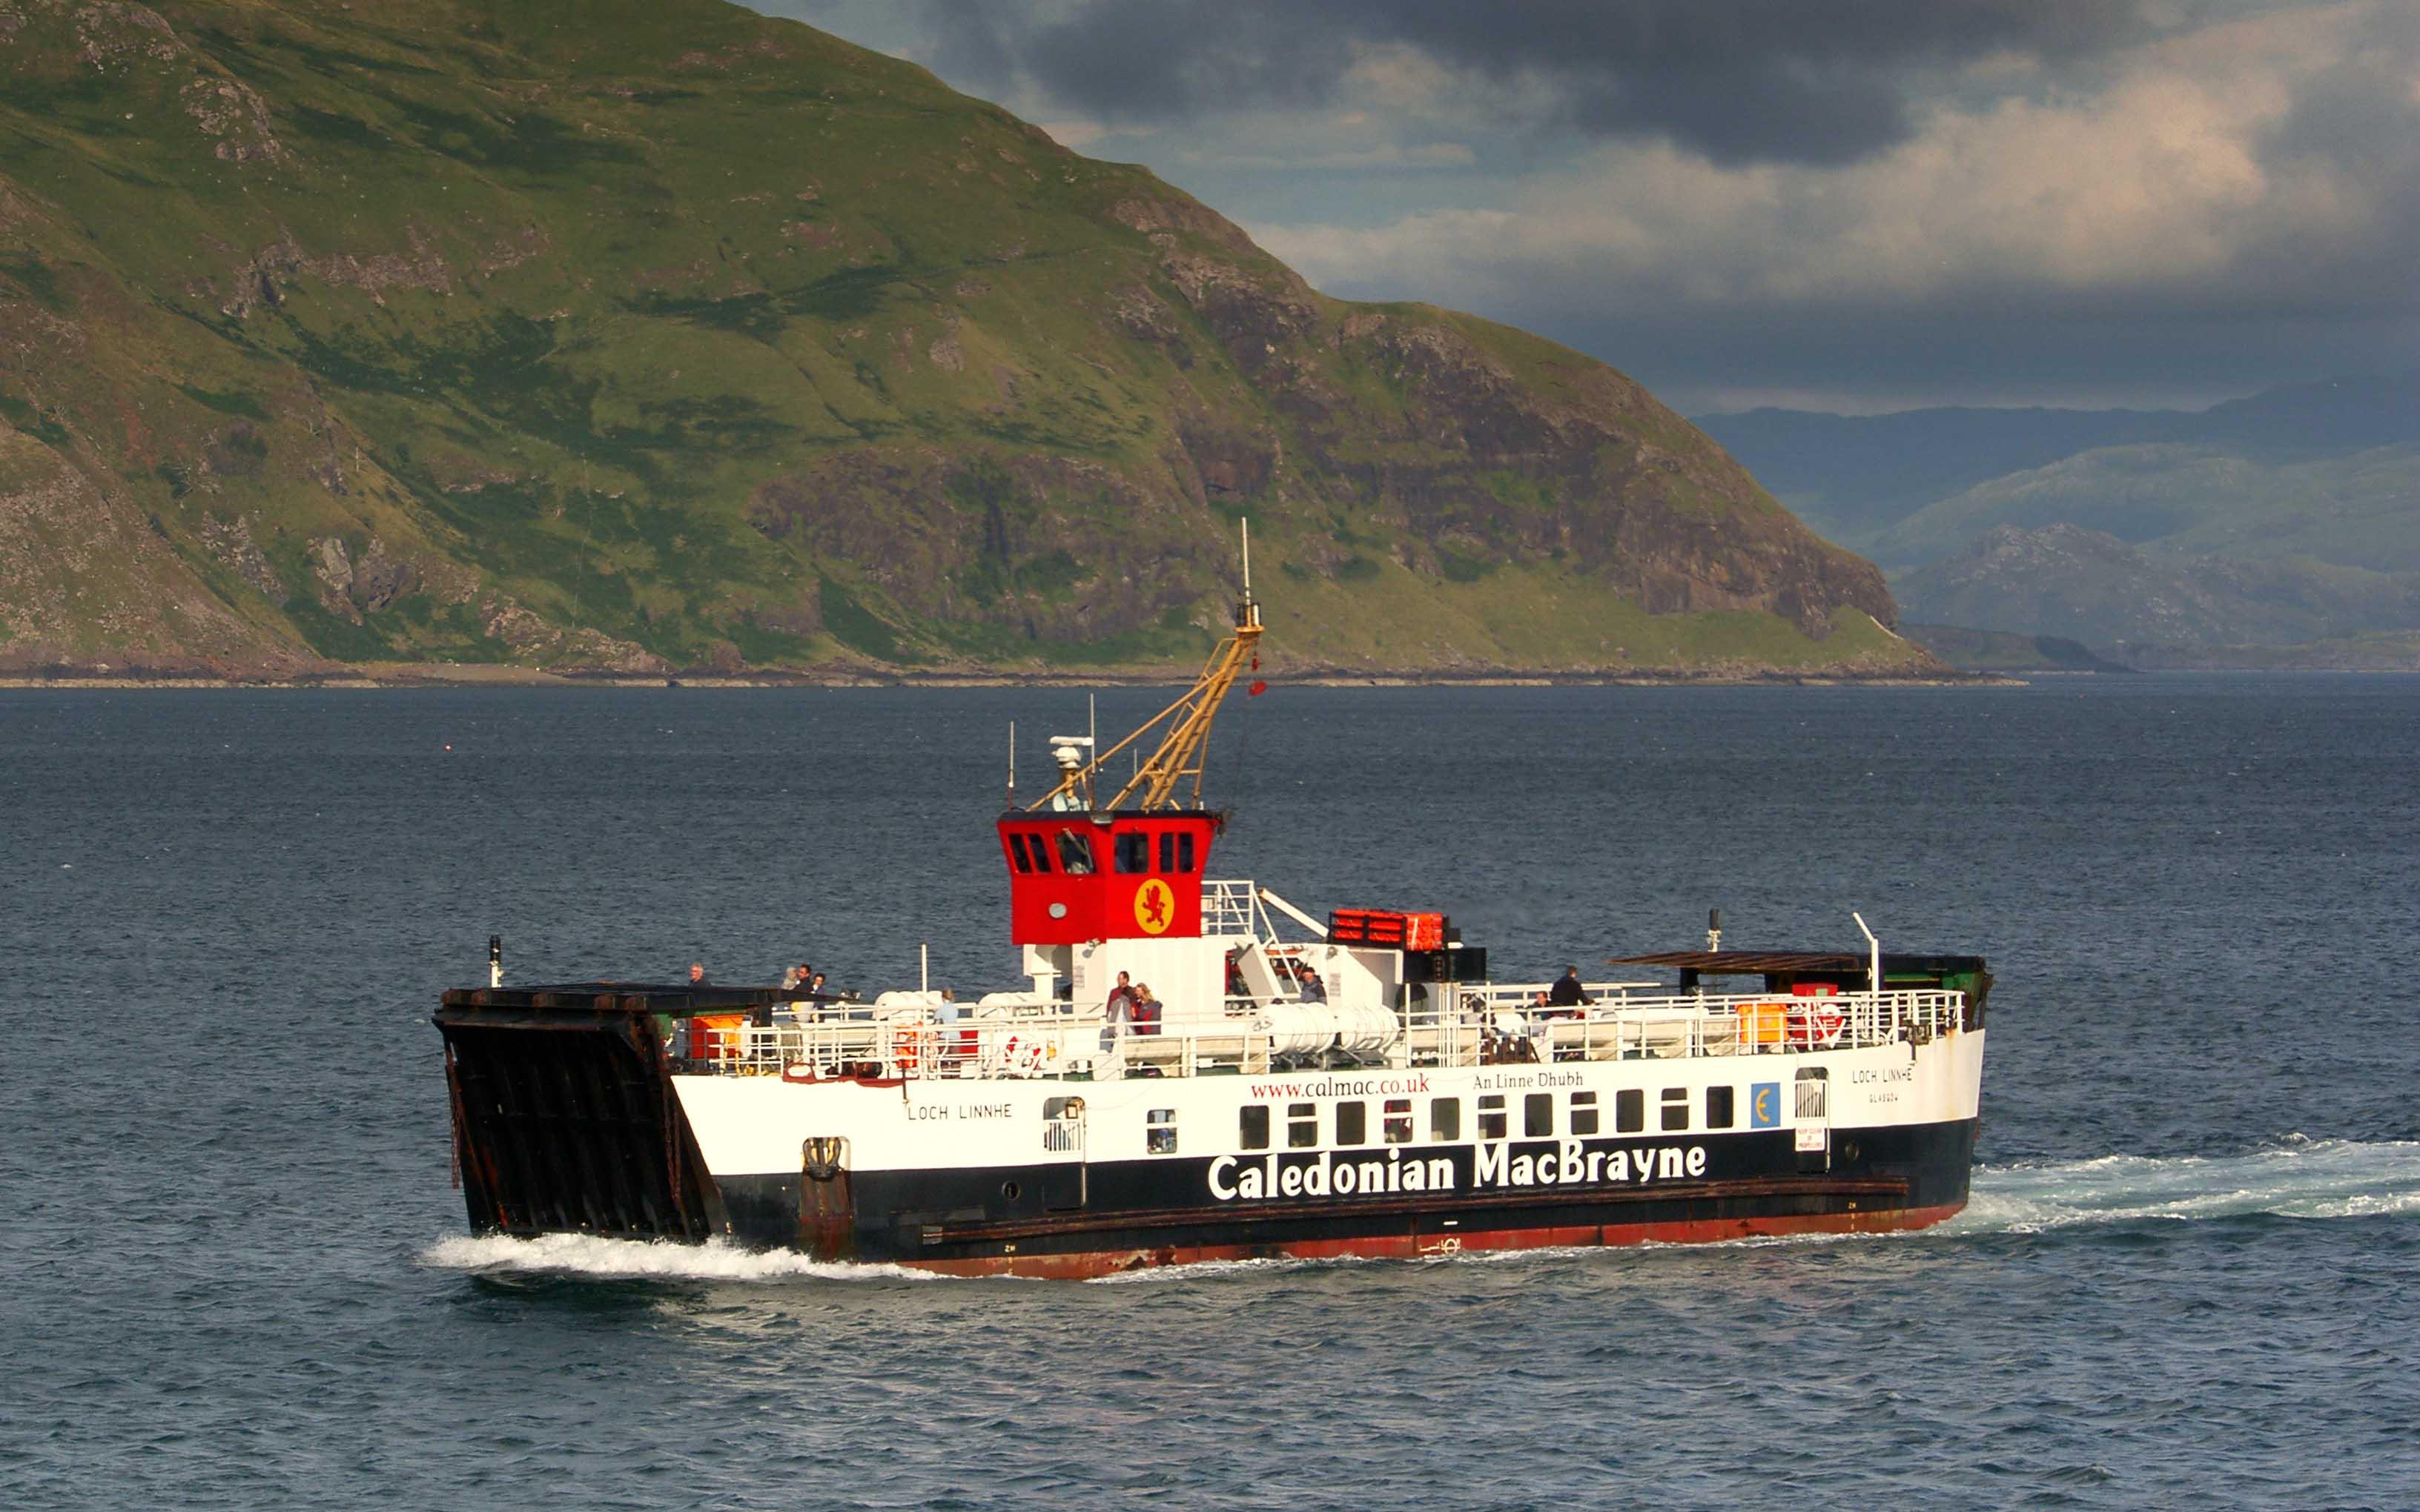 Loch Linnhe crossing to Kilchoan (Ships of CalMac)